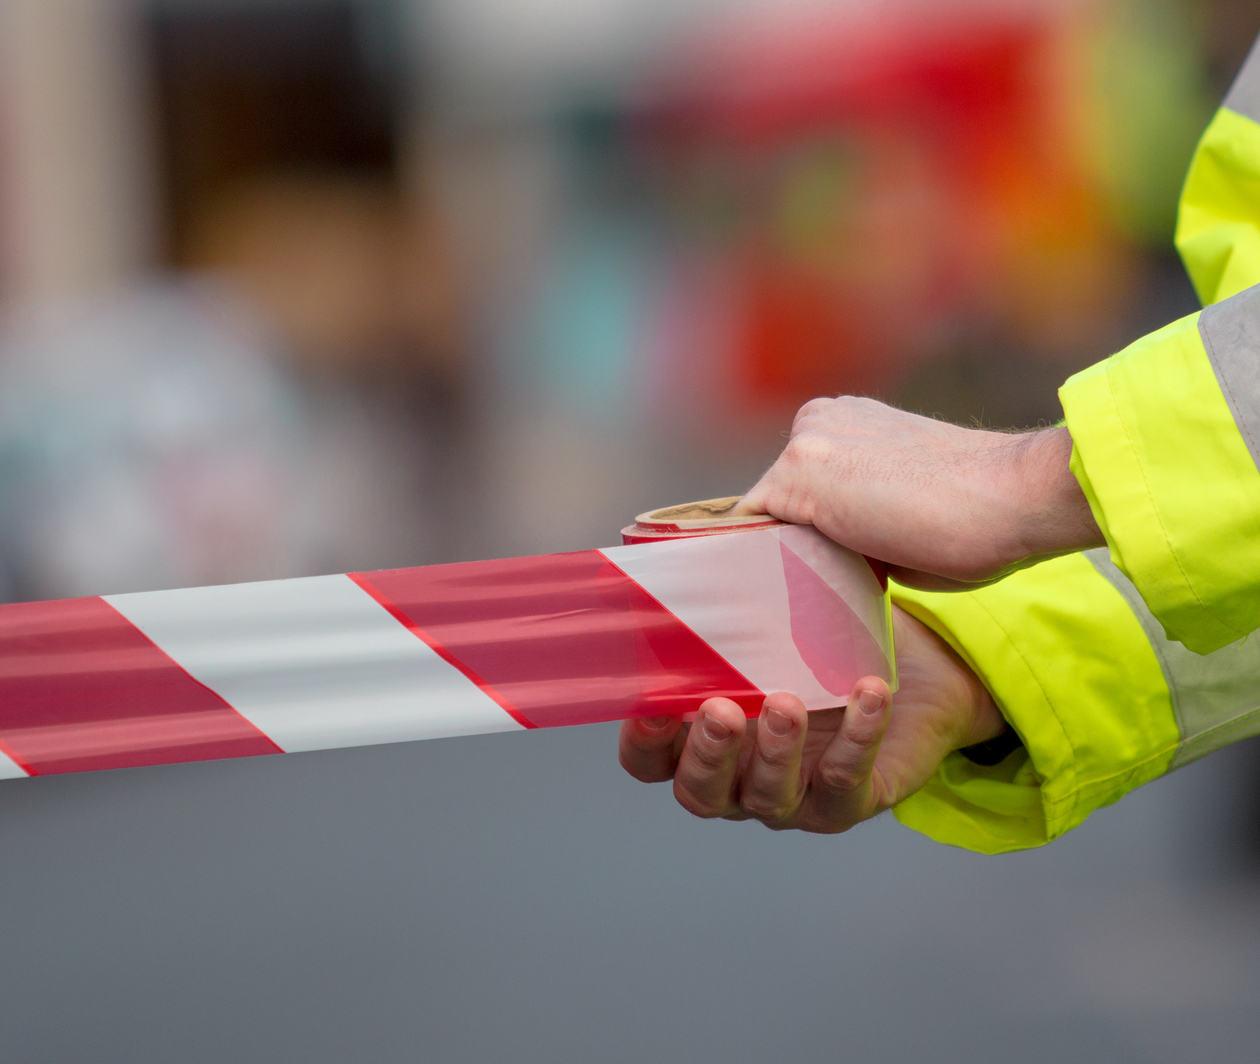 Emergency Planning and Preparedness Practice